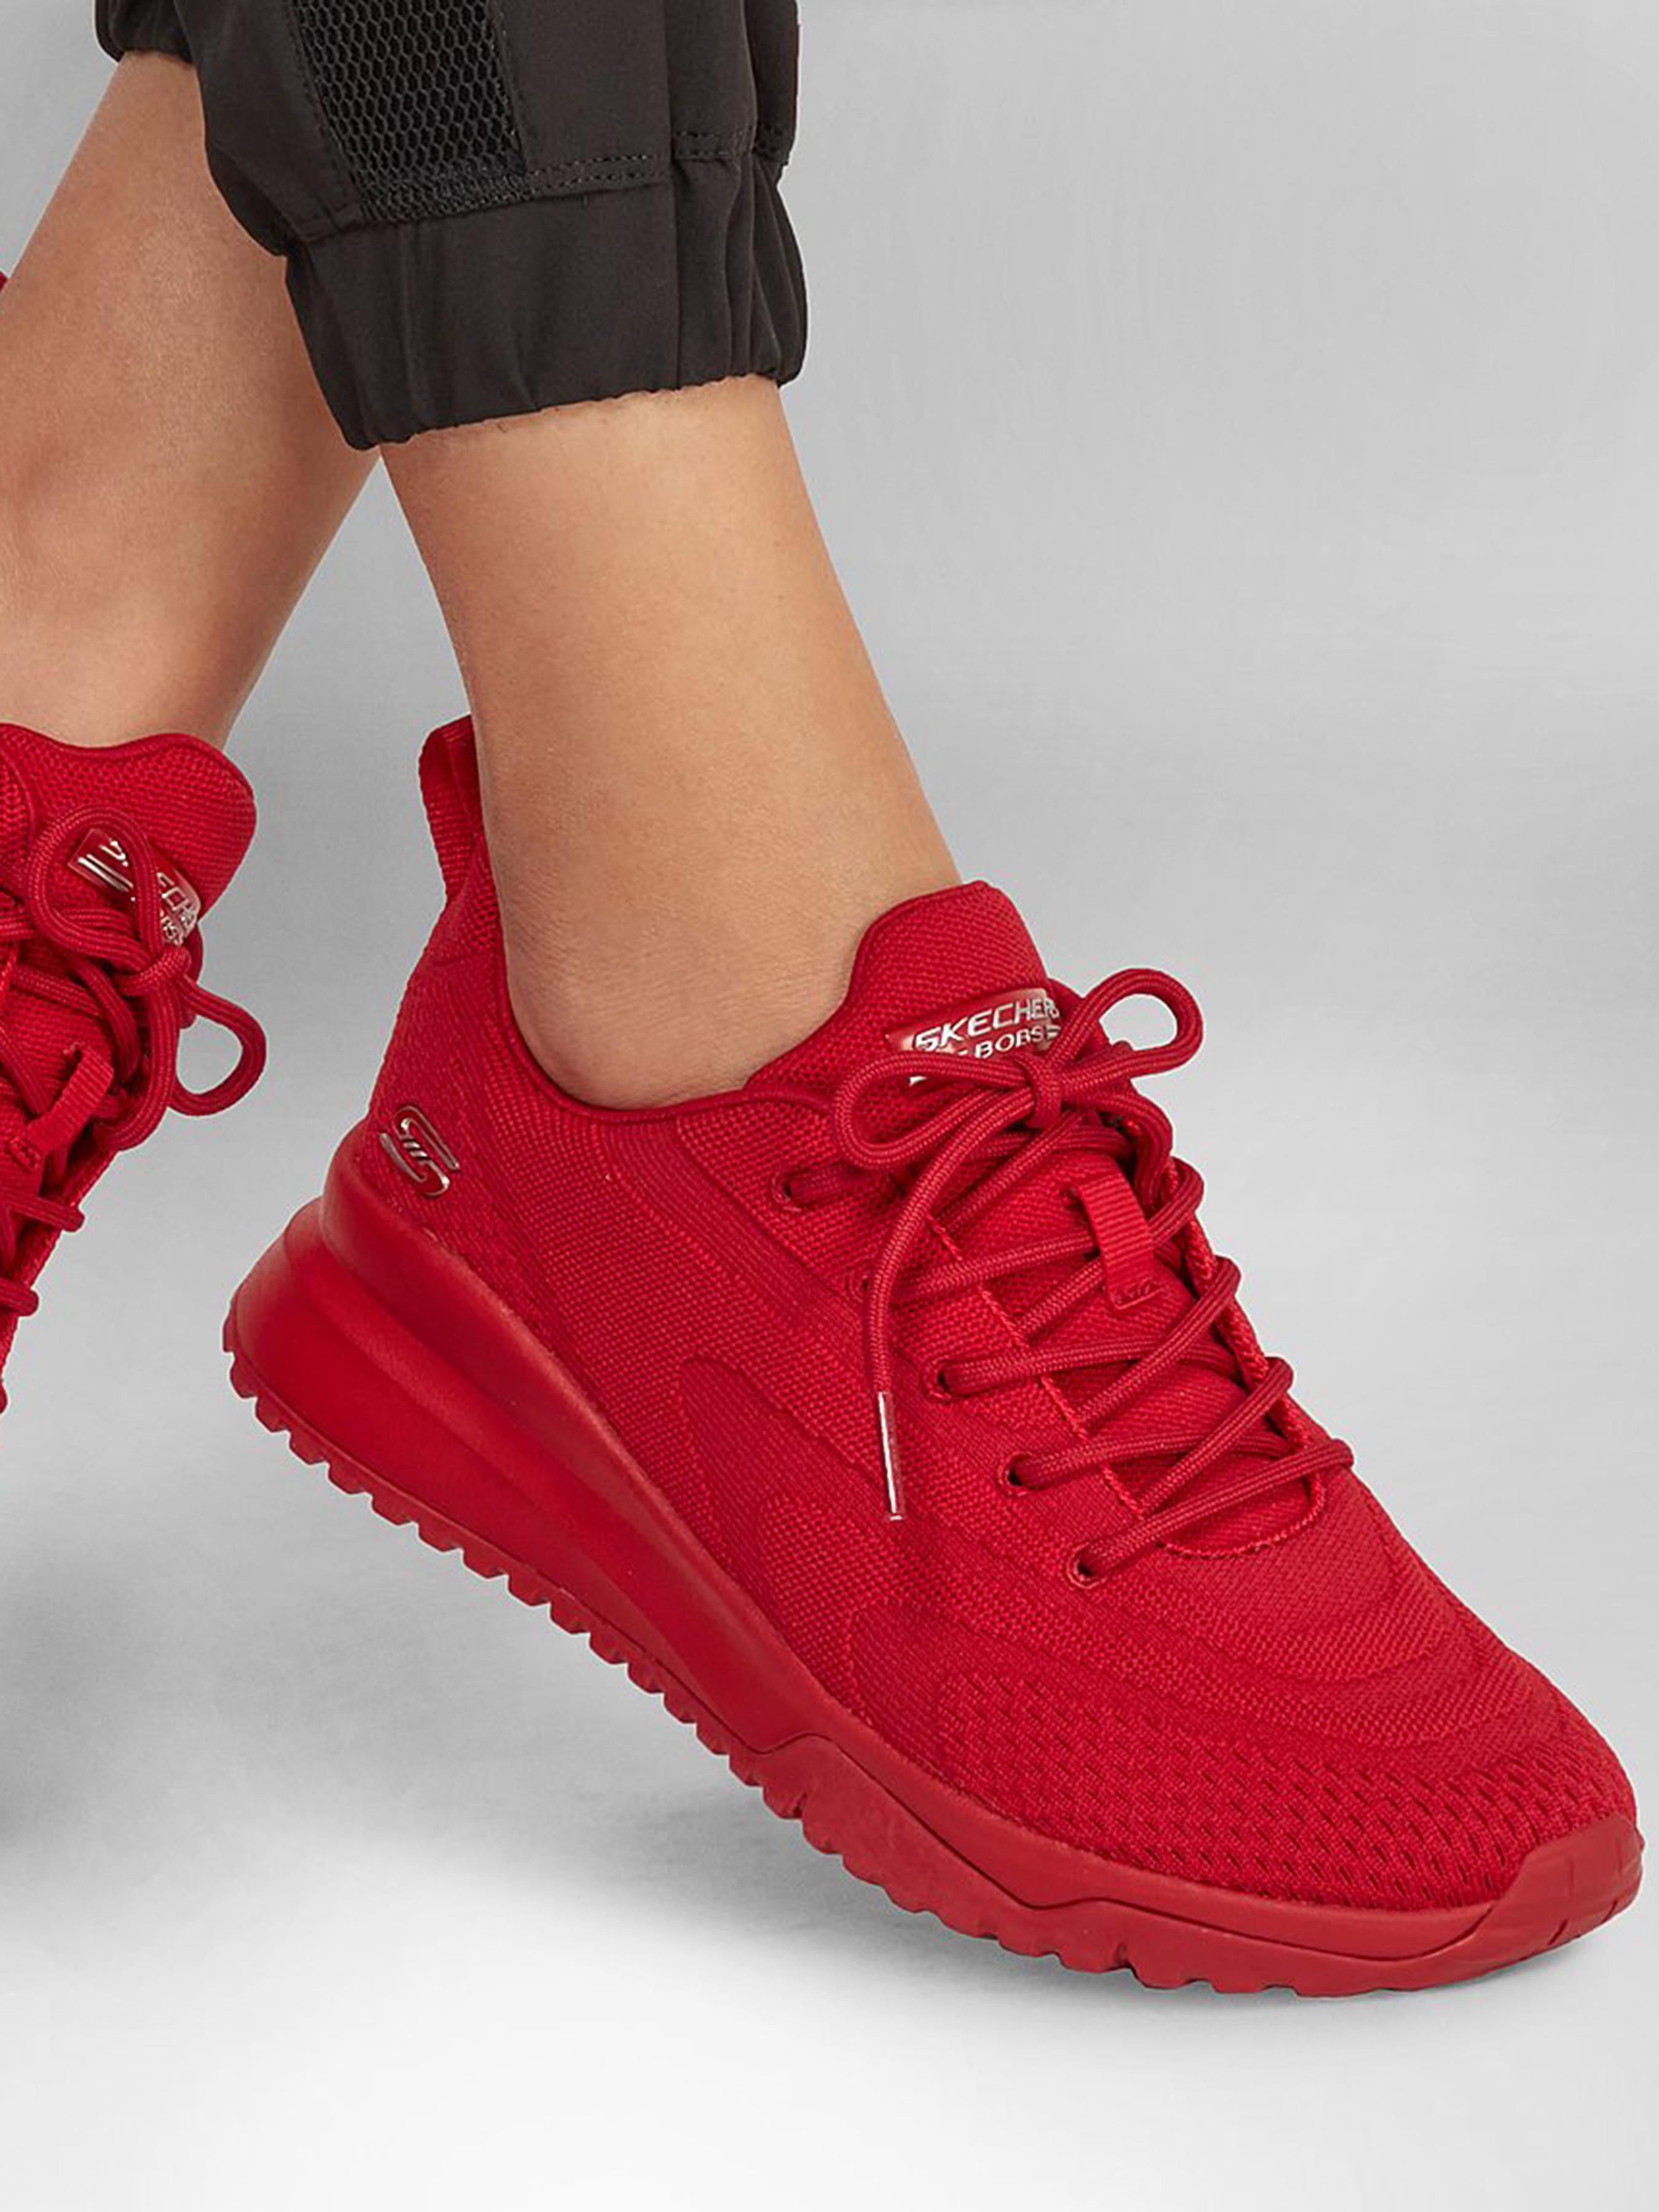 Кросівки для міста Skechers BOBS Sport Squad 3 117178 RED